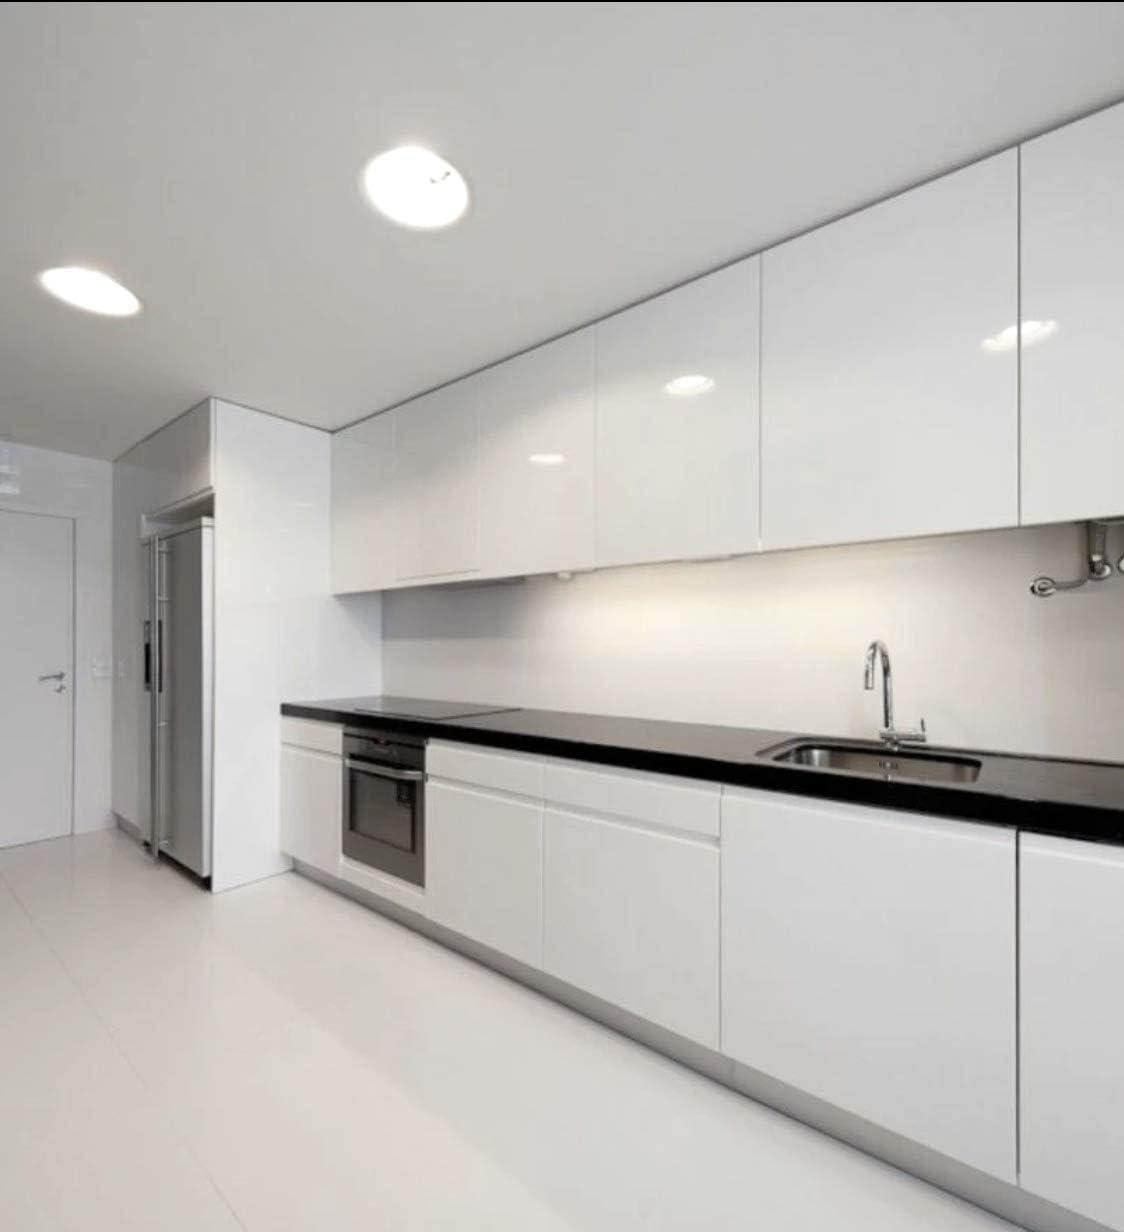 White Gloss Kitchen Cabinets Design Modern Gloss White Kitchen cabinets     Amazon.com